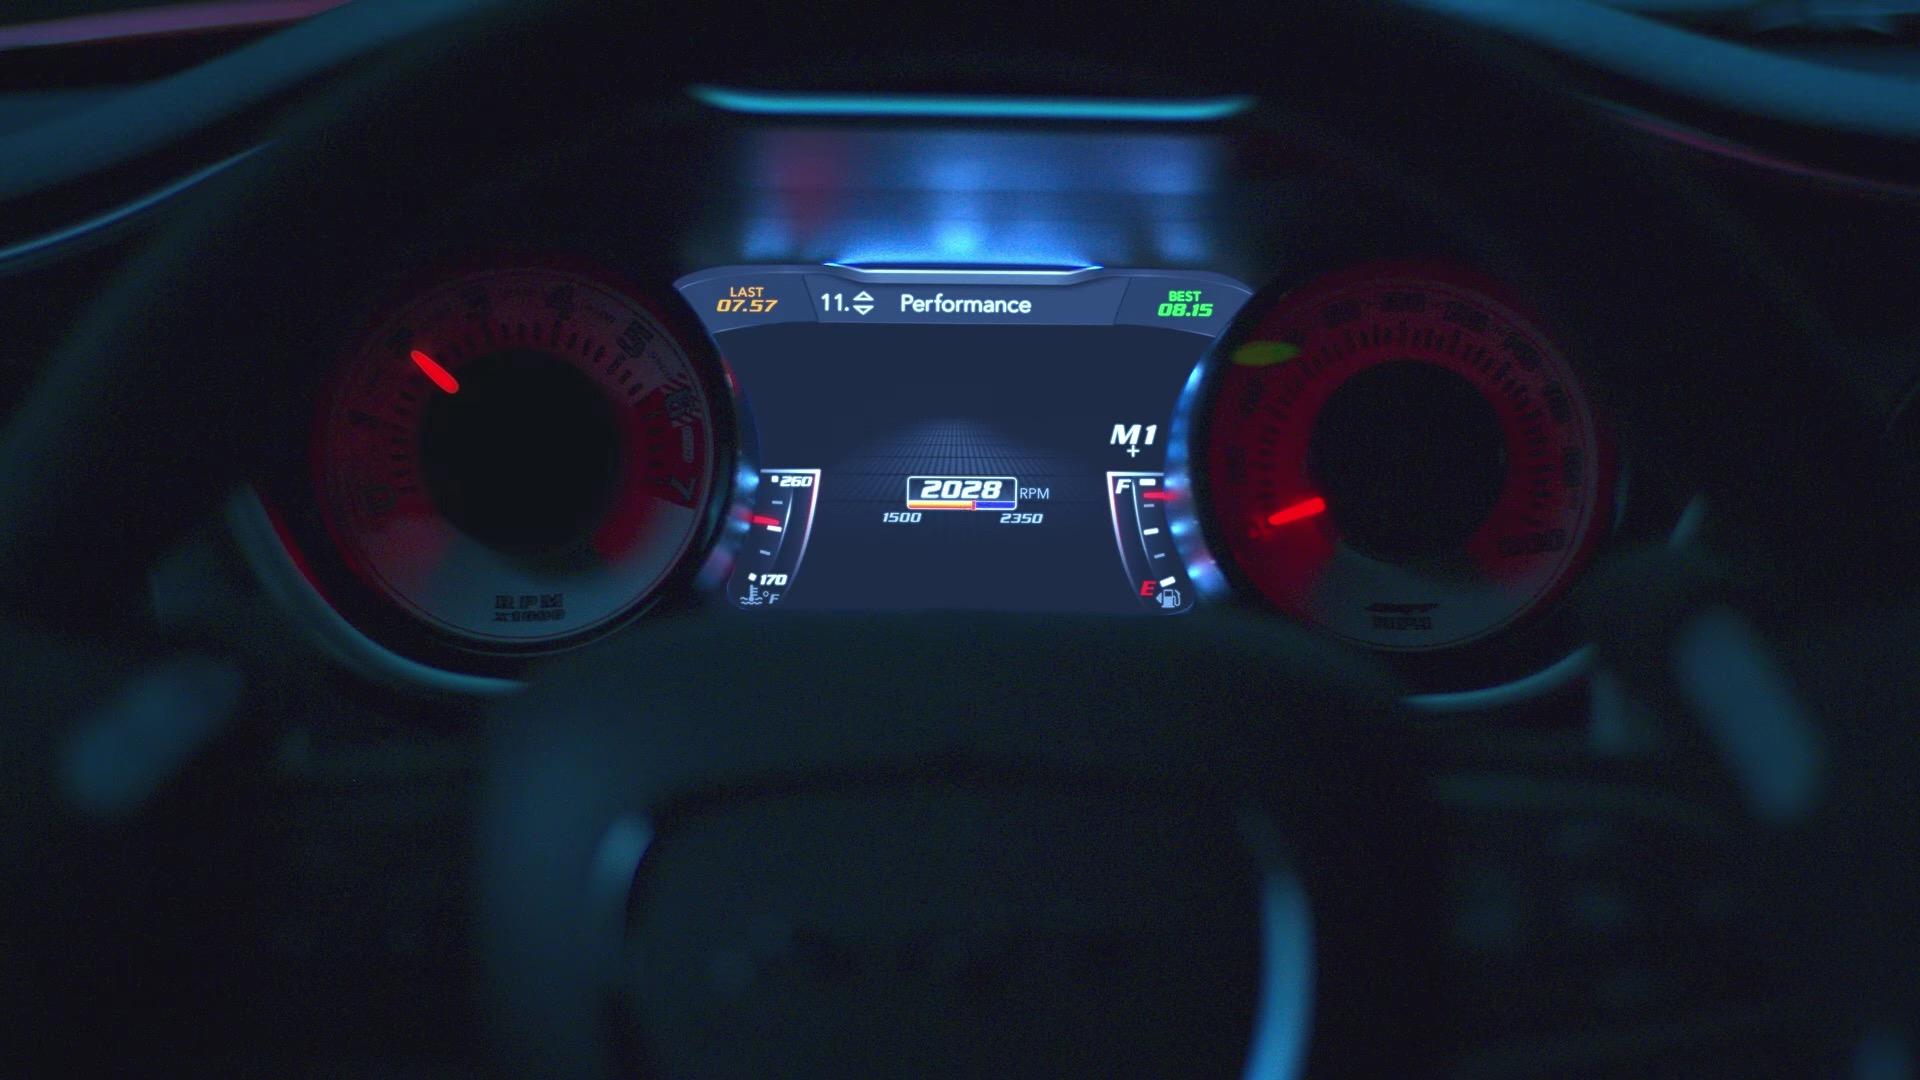 The 2018 Dodge Challenger SRT Demon Plot Thickens With Latest Teaser - autoevolution